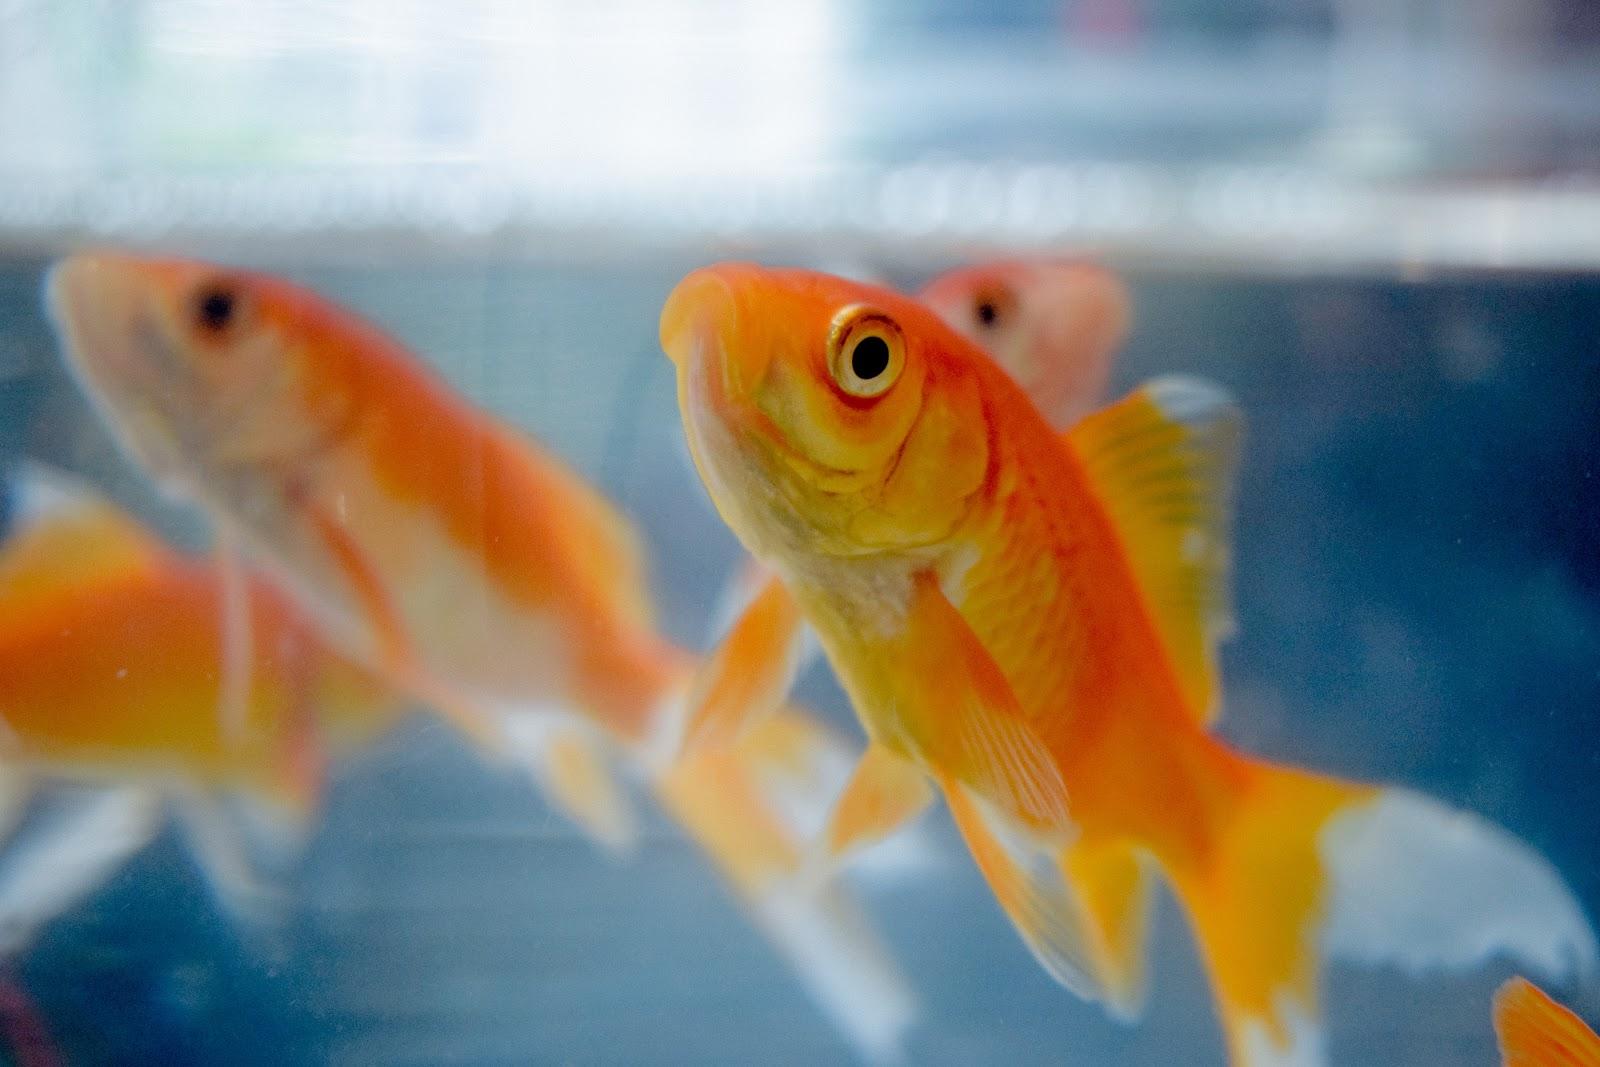 Several goldfish